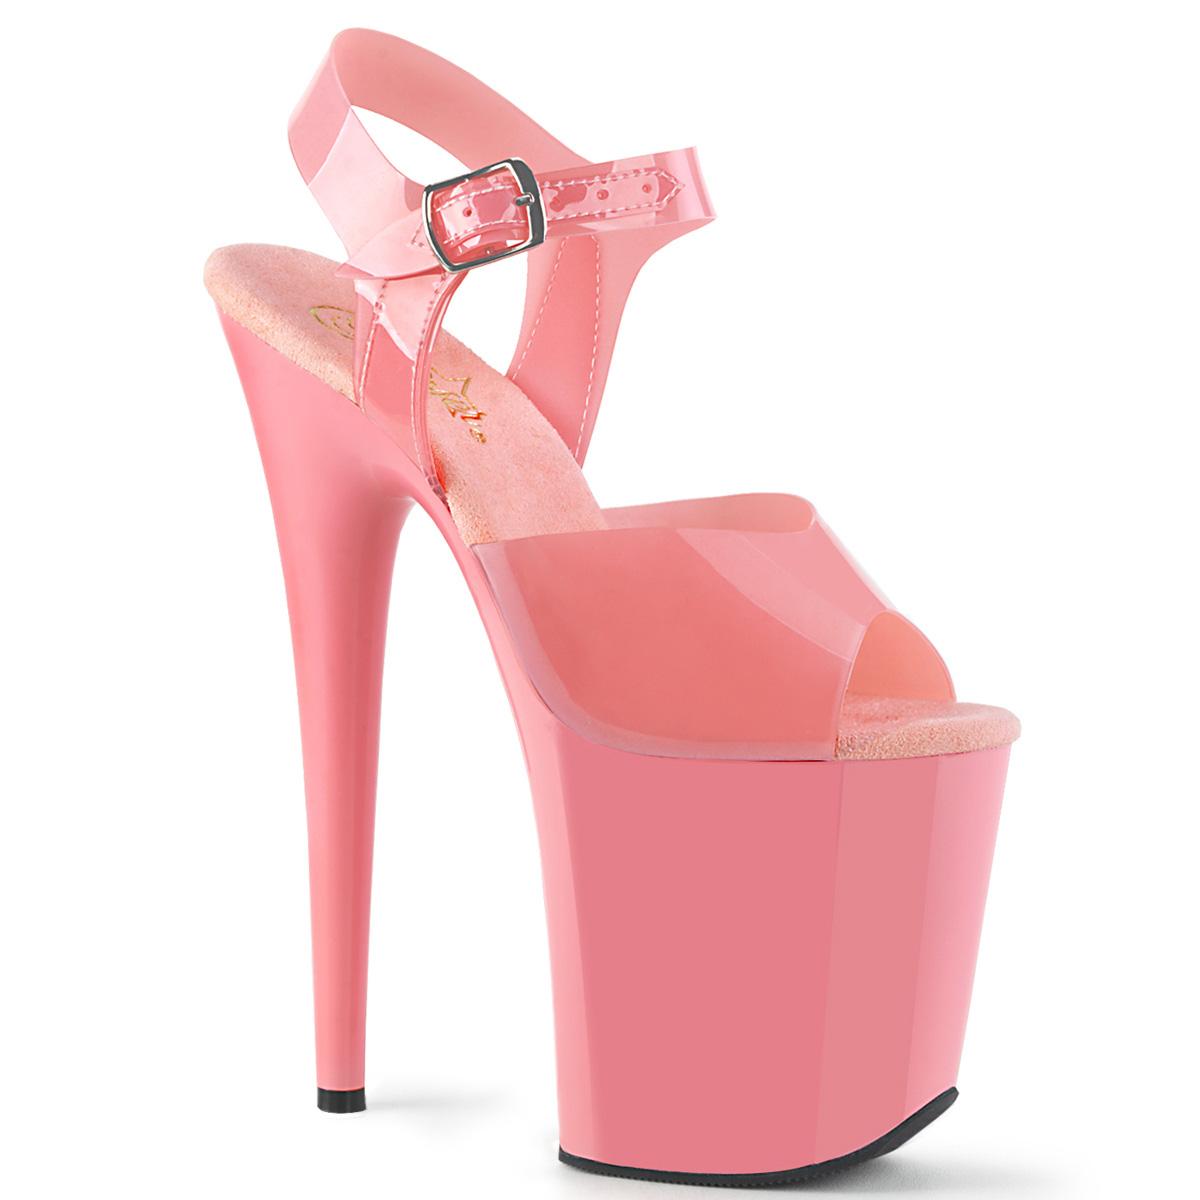 685d6dfbc6d Extreme Platform Heels FLAMINGO-808N - TPU Baby Pink